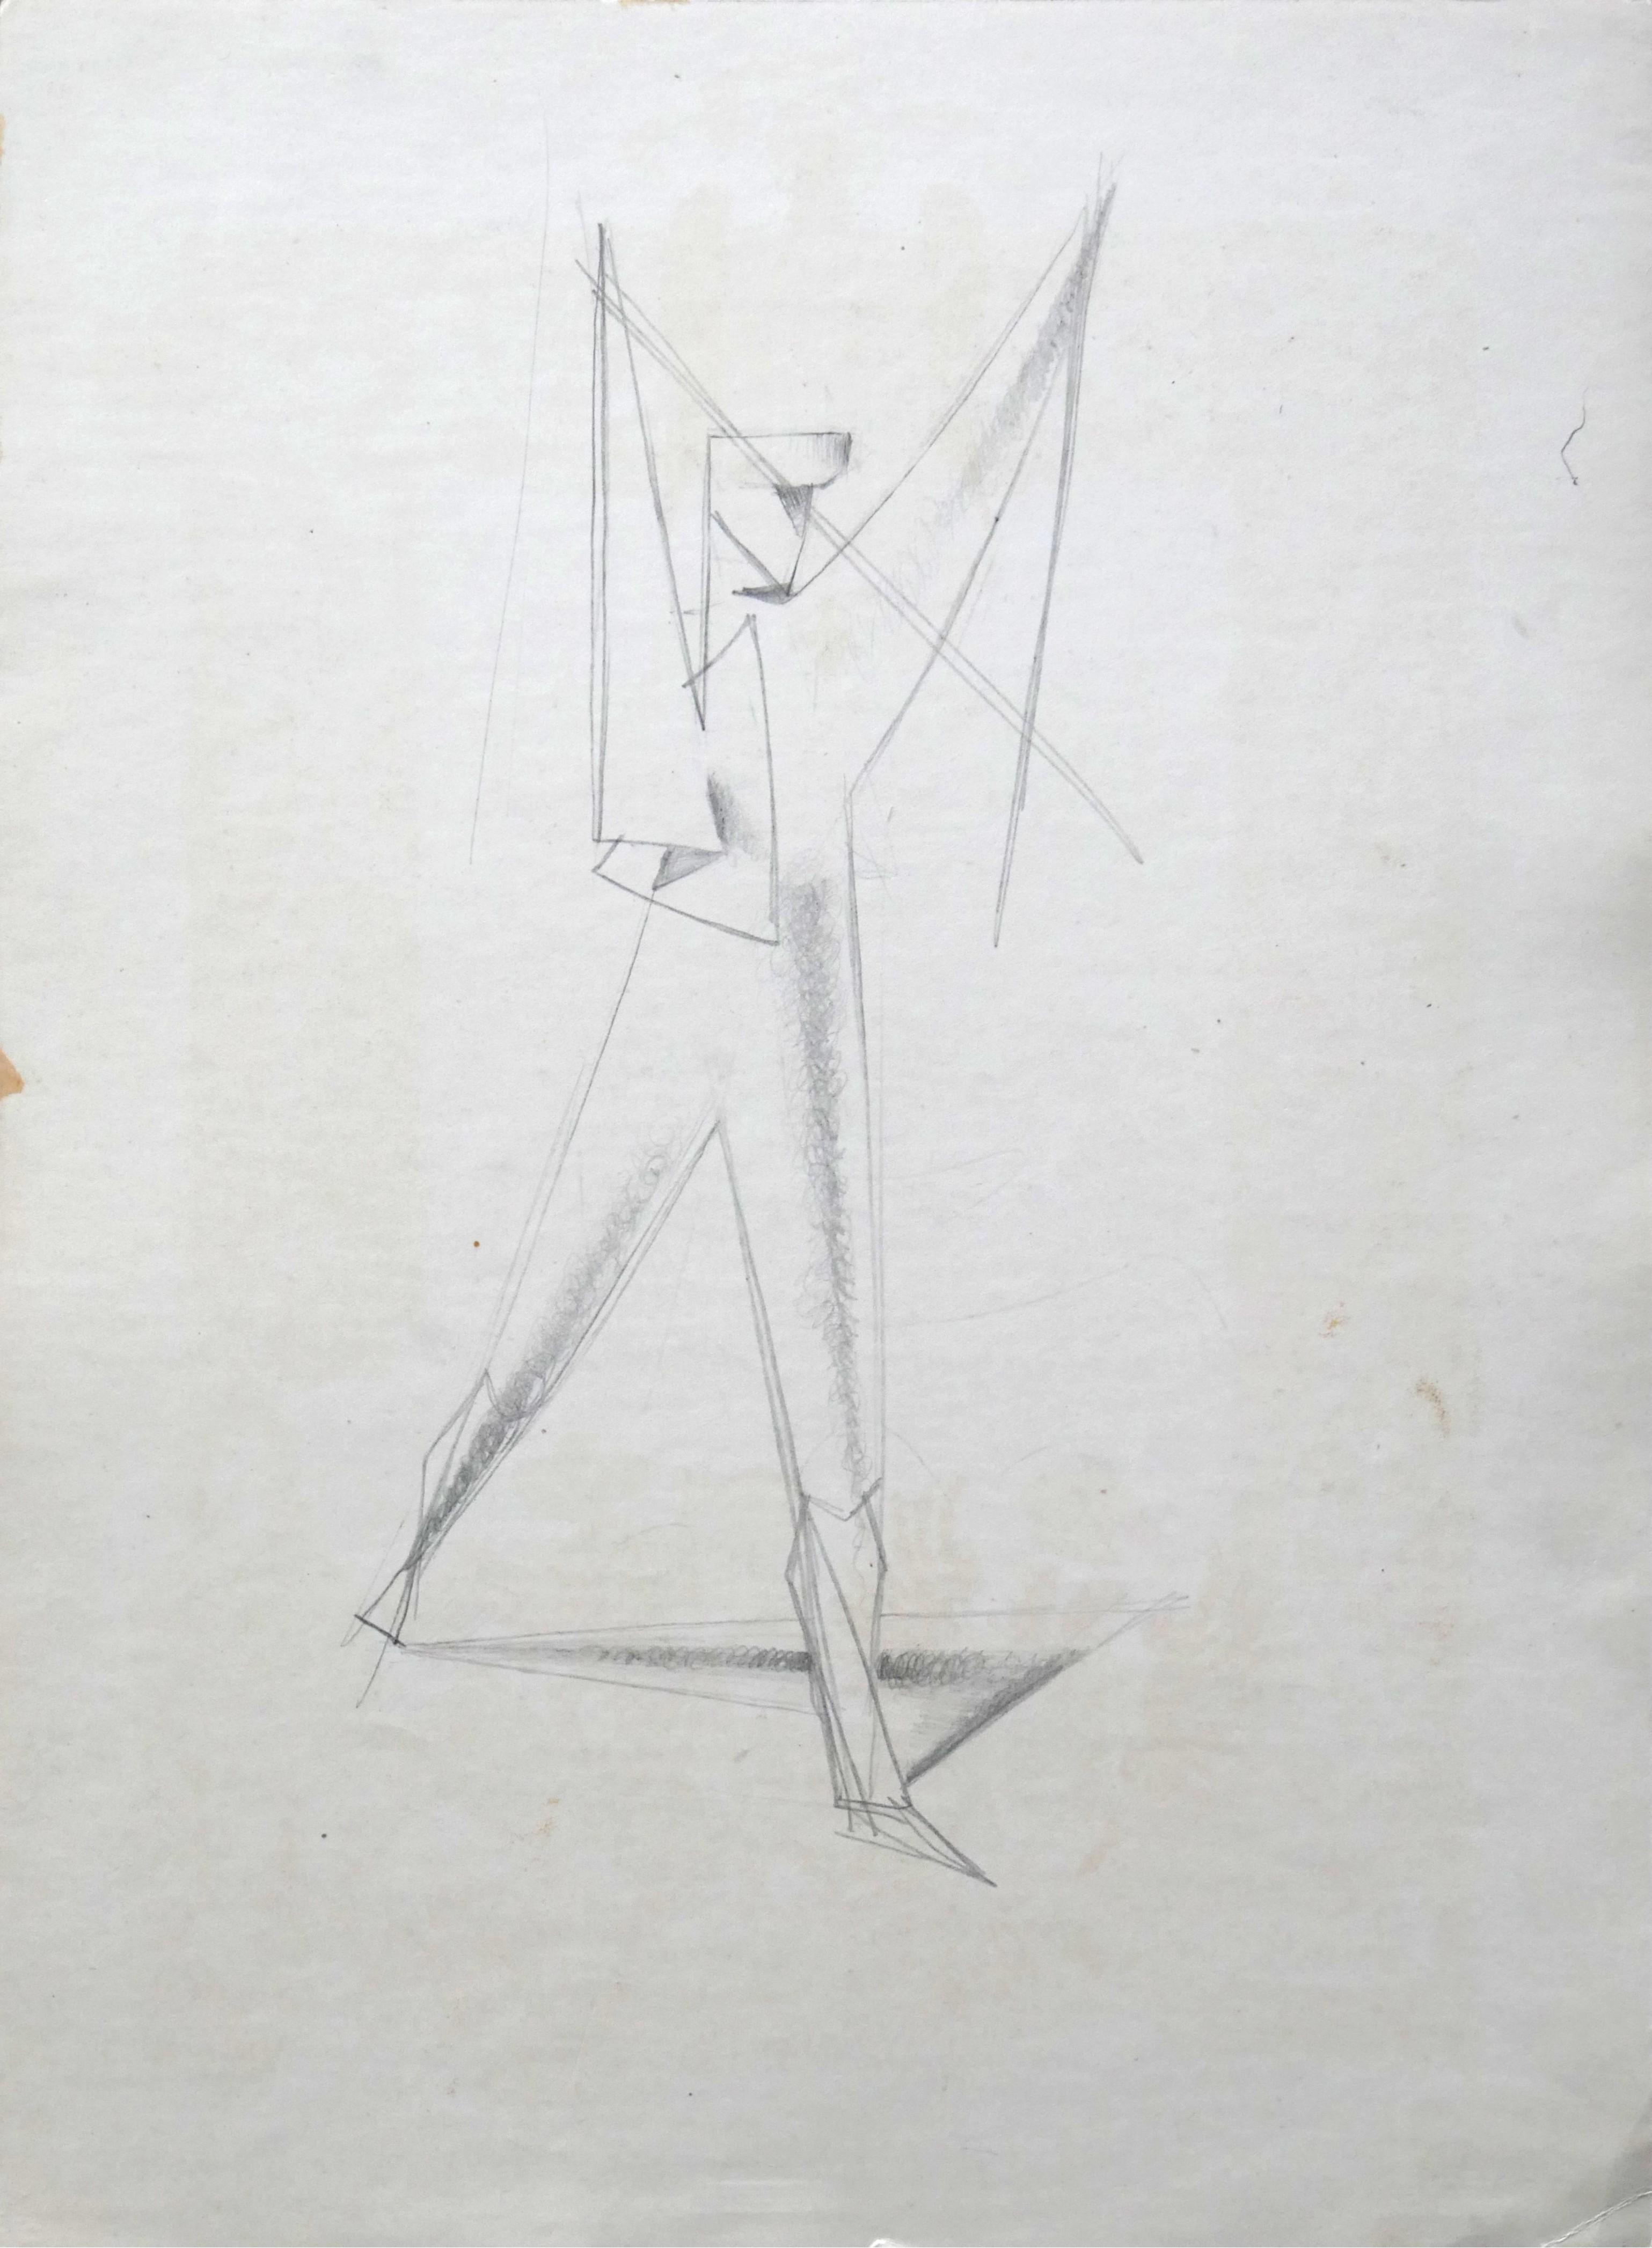 1977.12. Torero. 32x23 cm. Lápiz con sombreado.